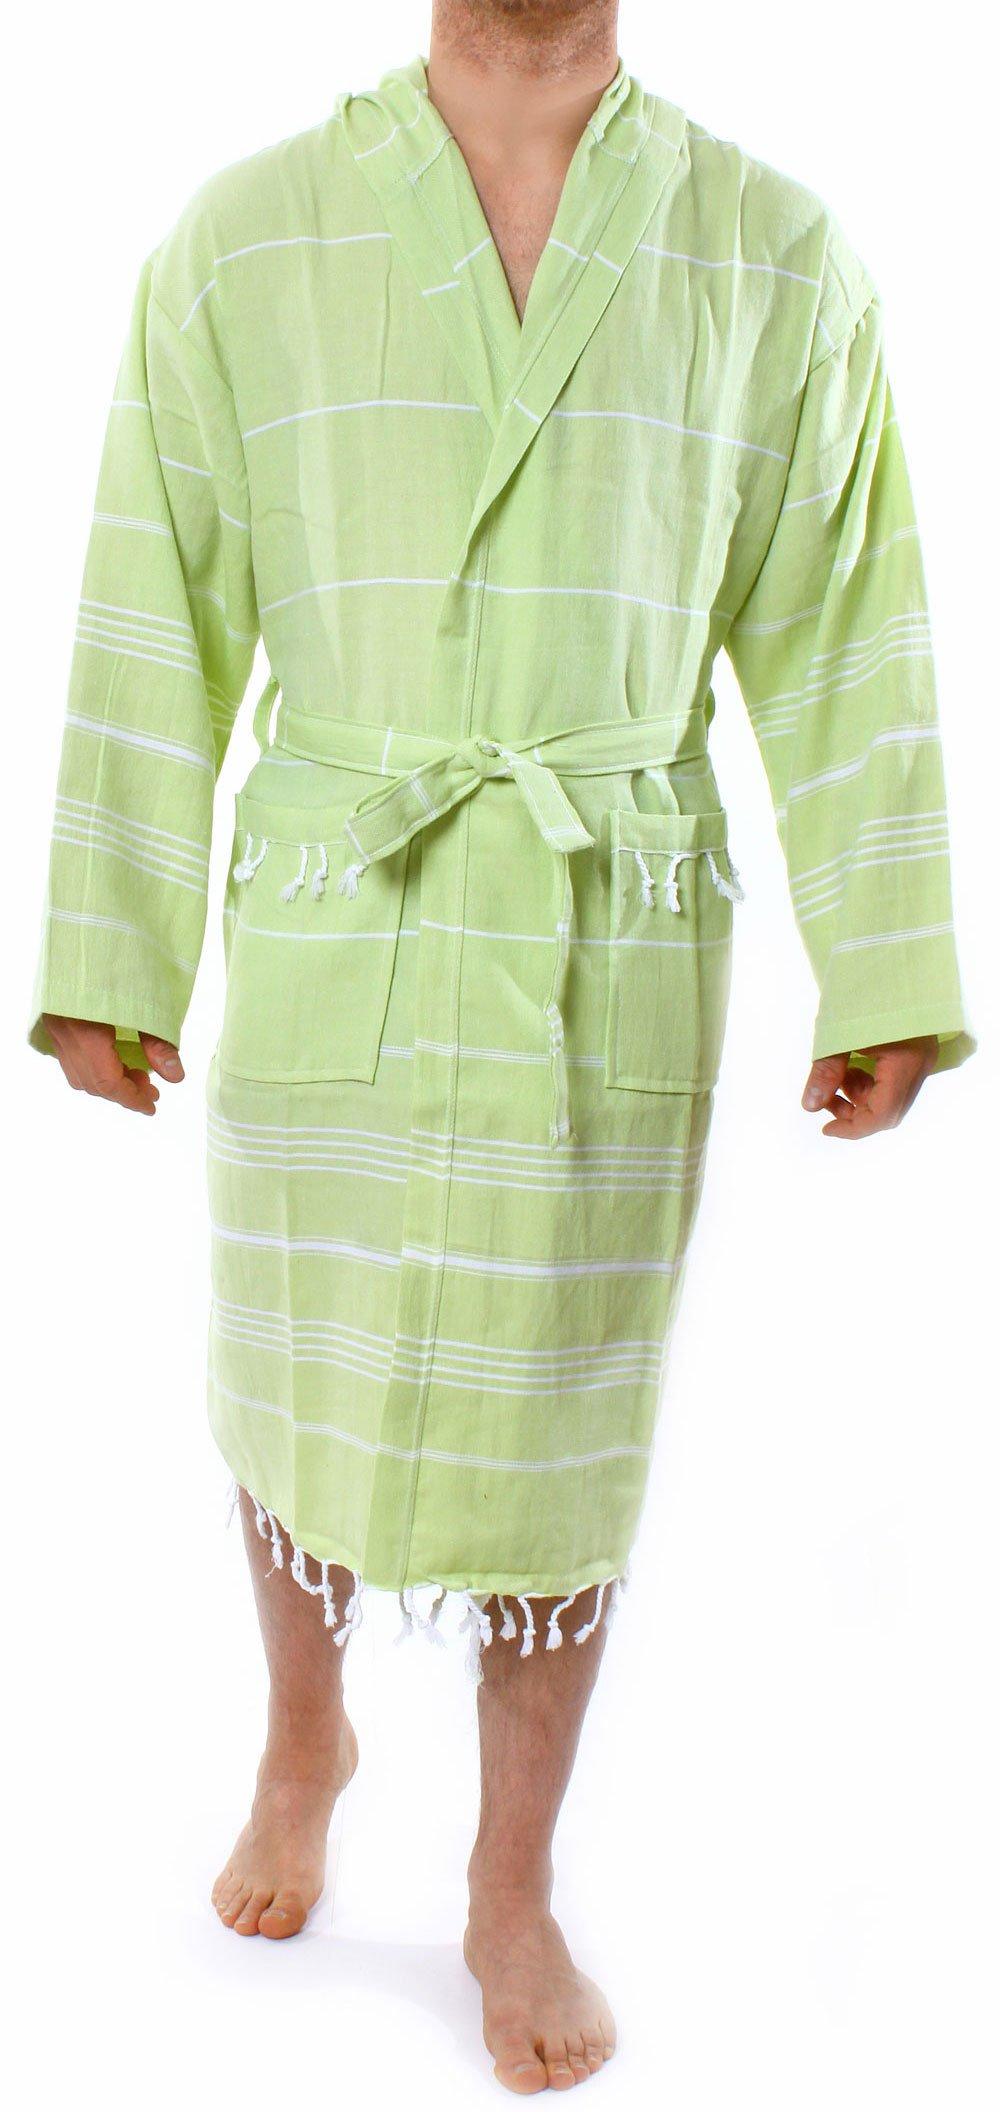 Cacala Hooded Bathrobe Pestemal Fabric 100% Turkish Cotton Kimono Unisex by Pistachiogreen